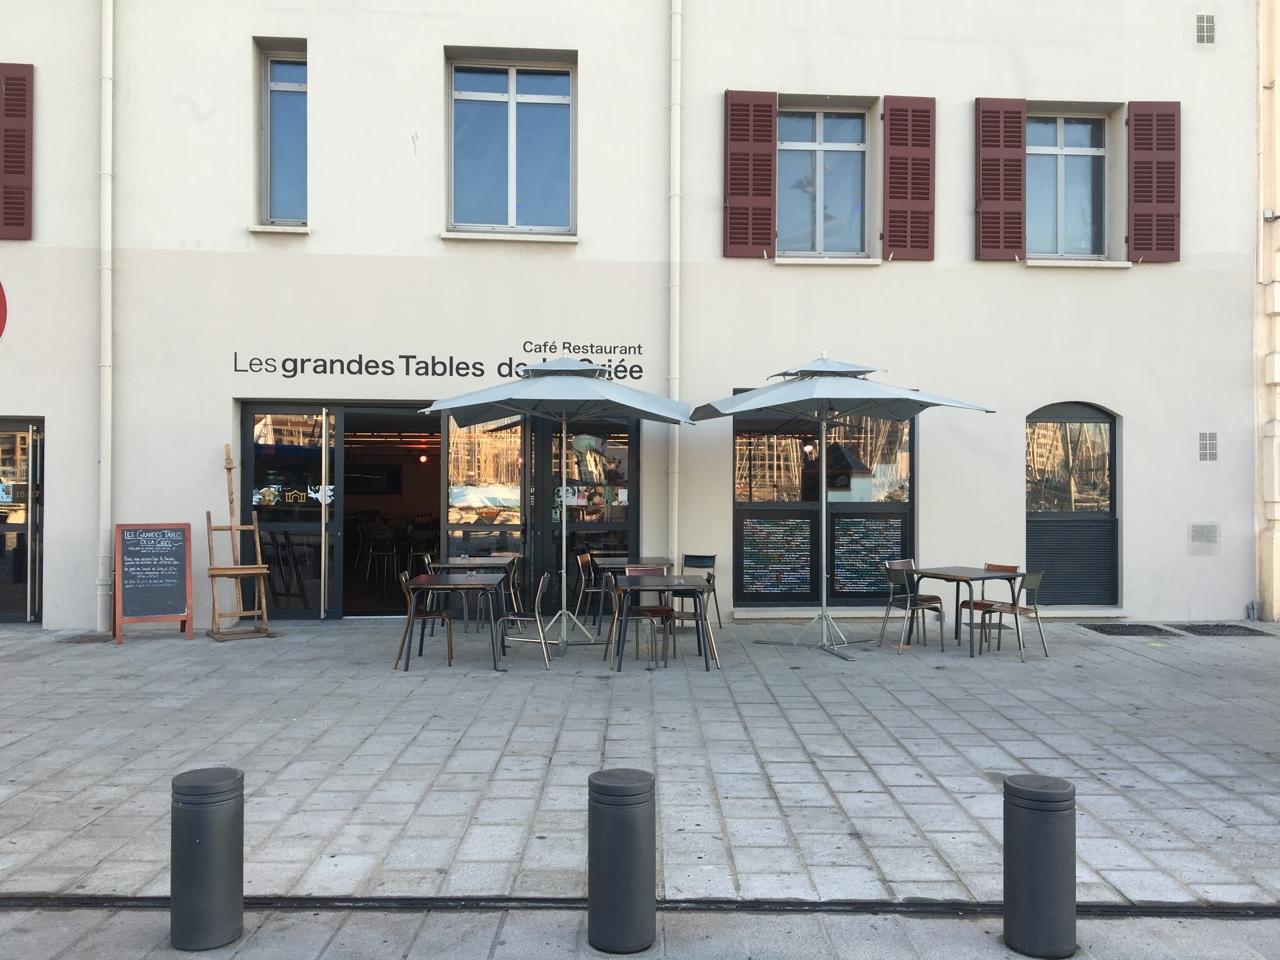 Restaurant vieux port les grandes tables de la cri e love spots - Les grandes tables de la friche ...